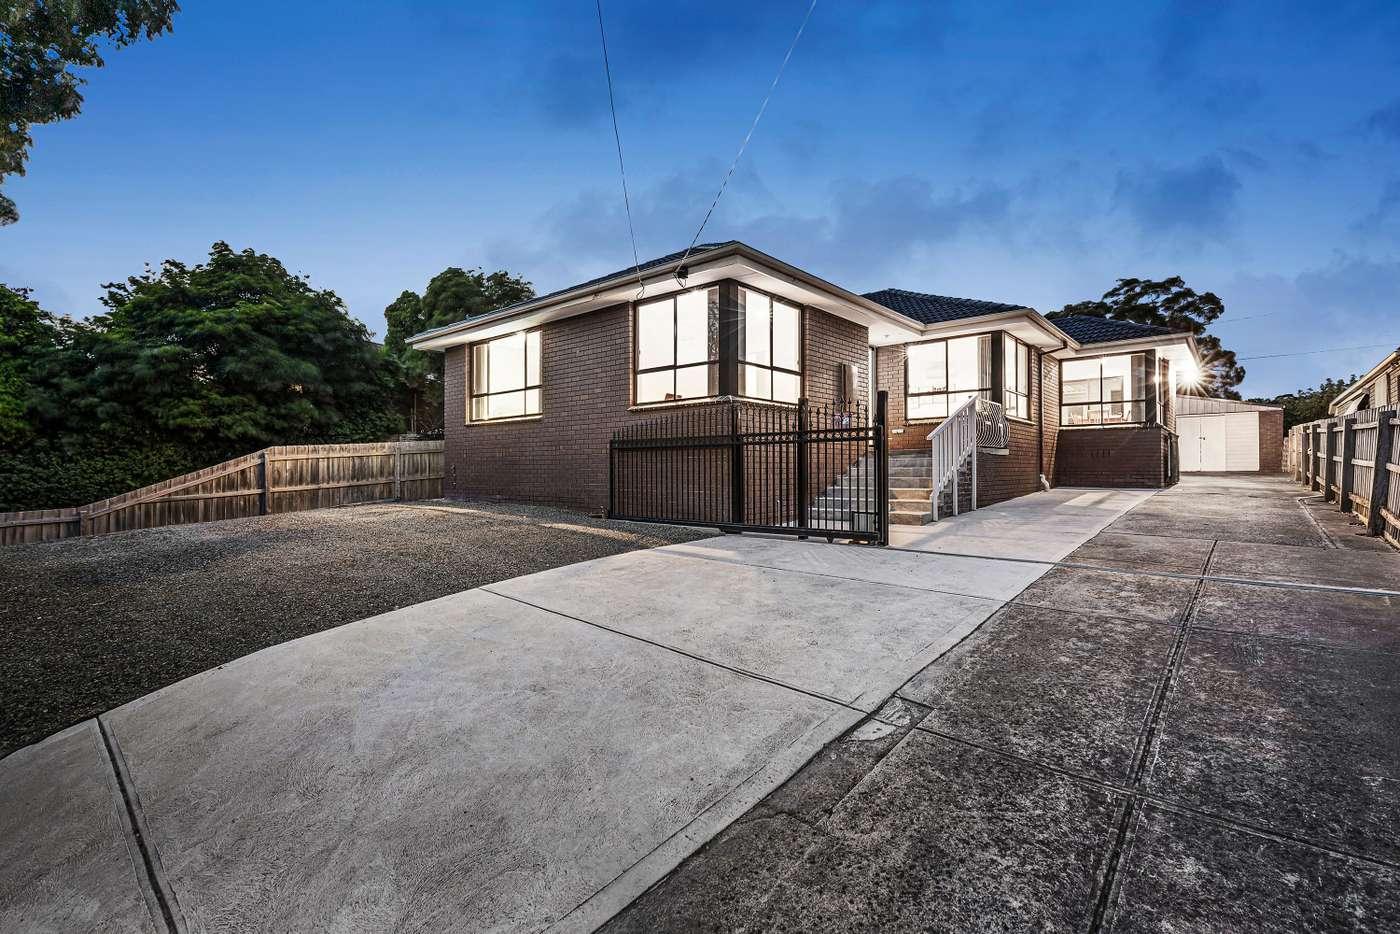 Main view of Homely house listing, 27 Kambara Drive, Mulgrave VIC 3170